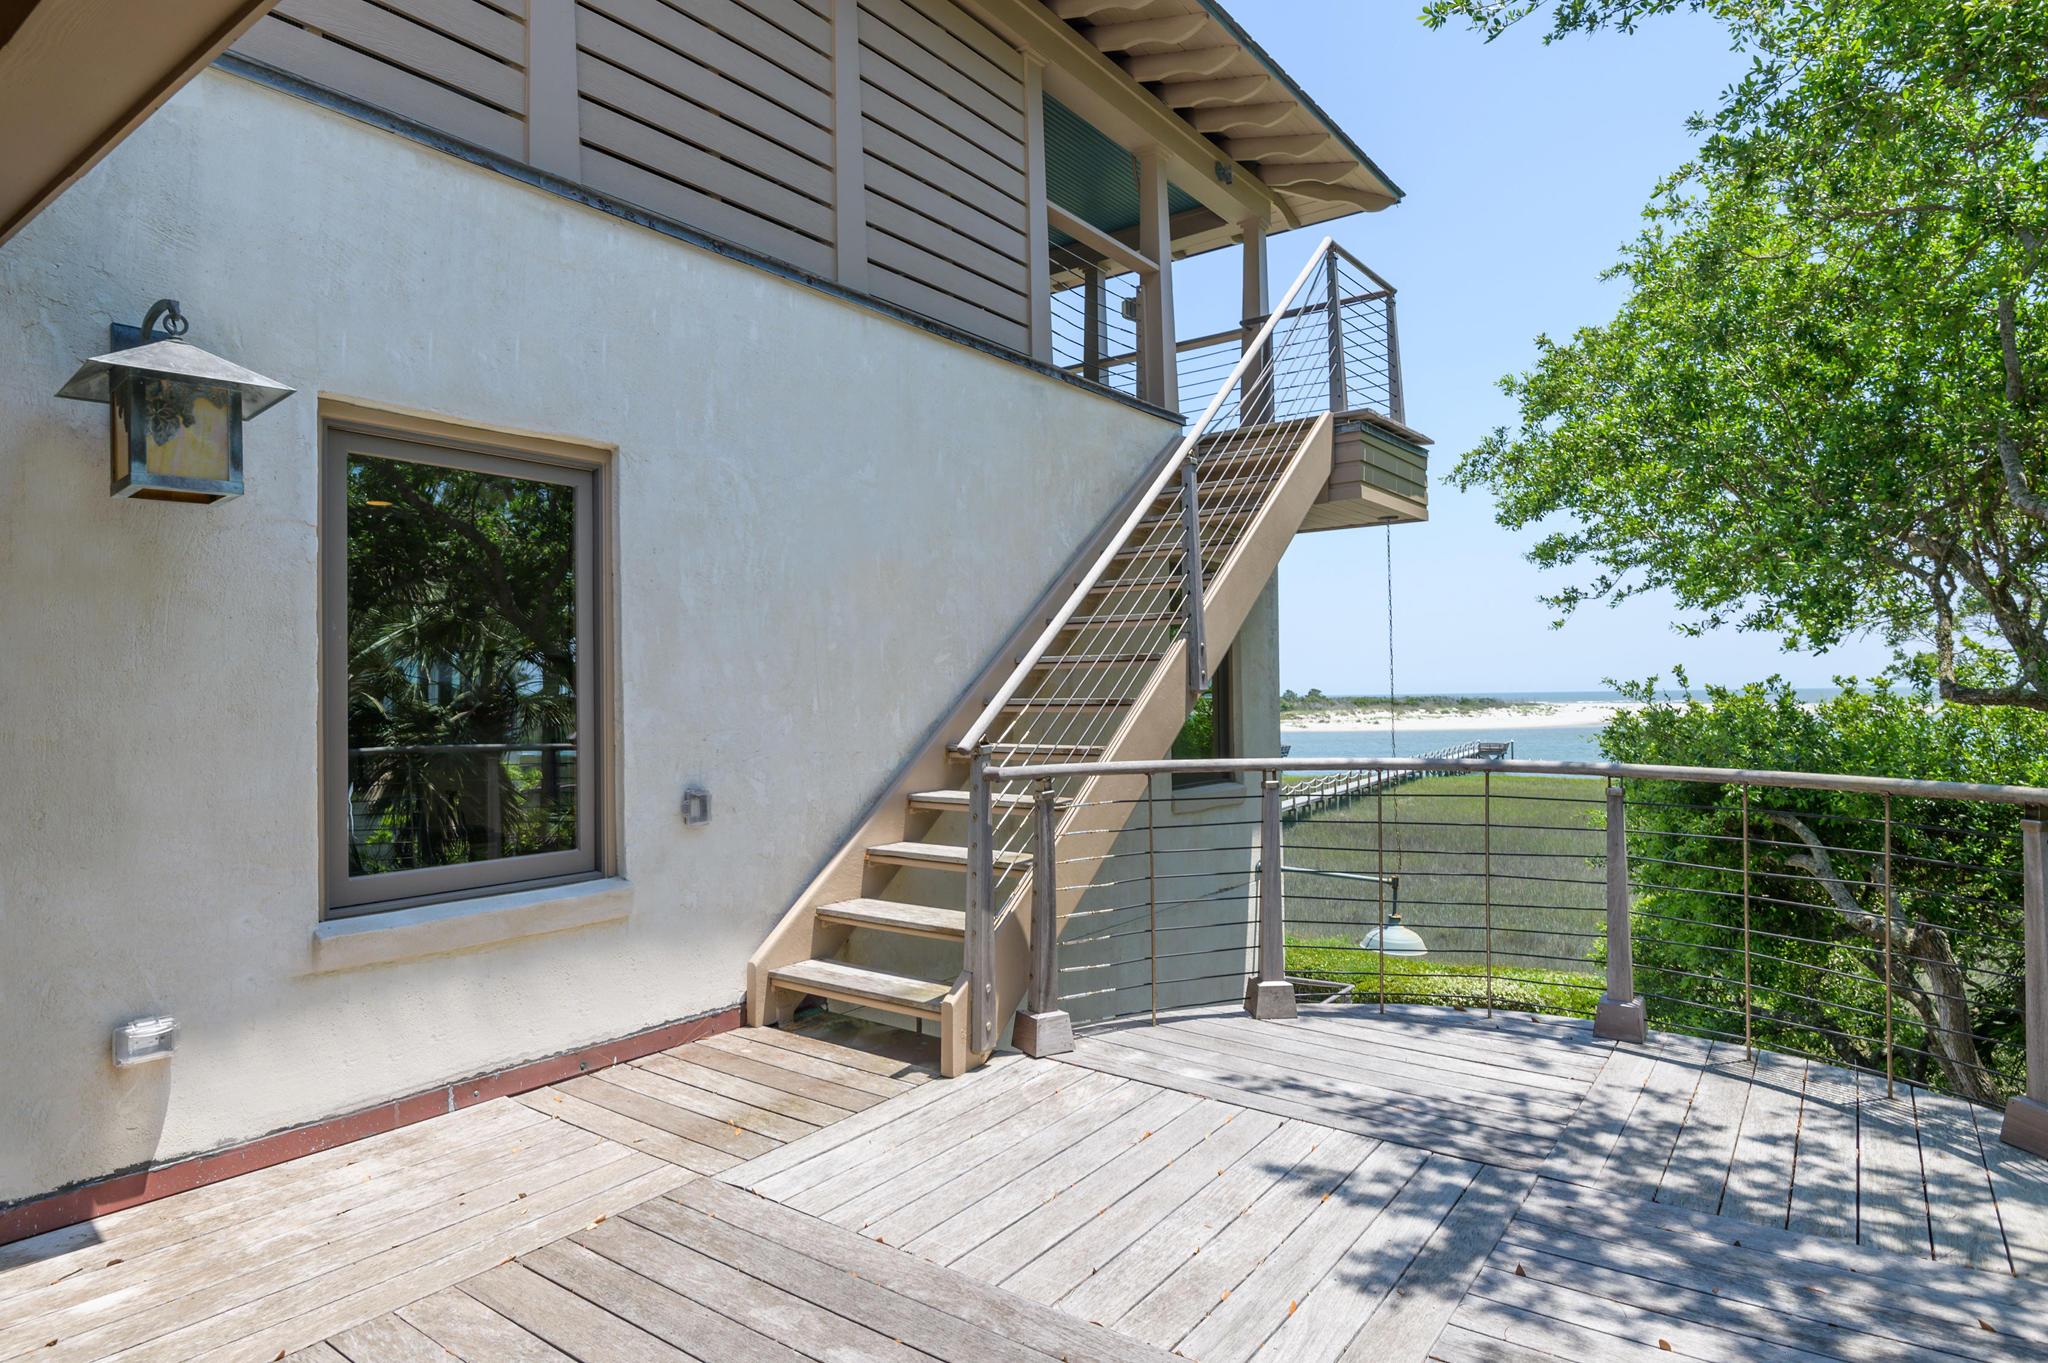 Seabrook Island Homes For Sale - 3087 Marshgate, Seabrook Island, SC - 3